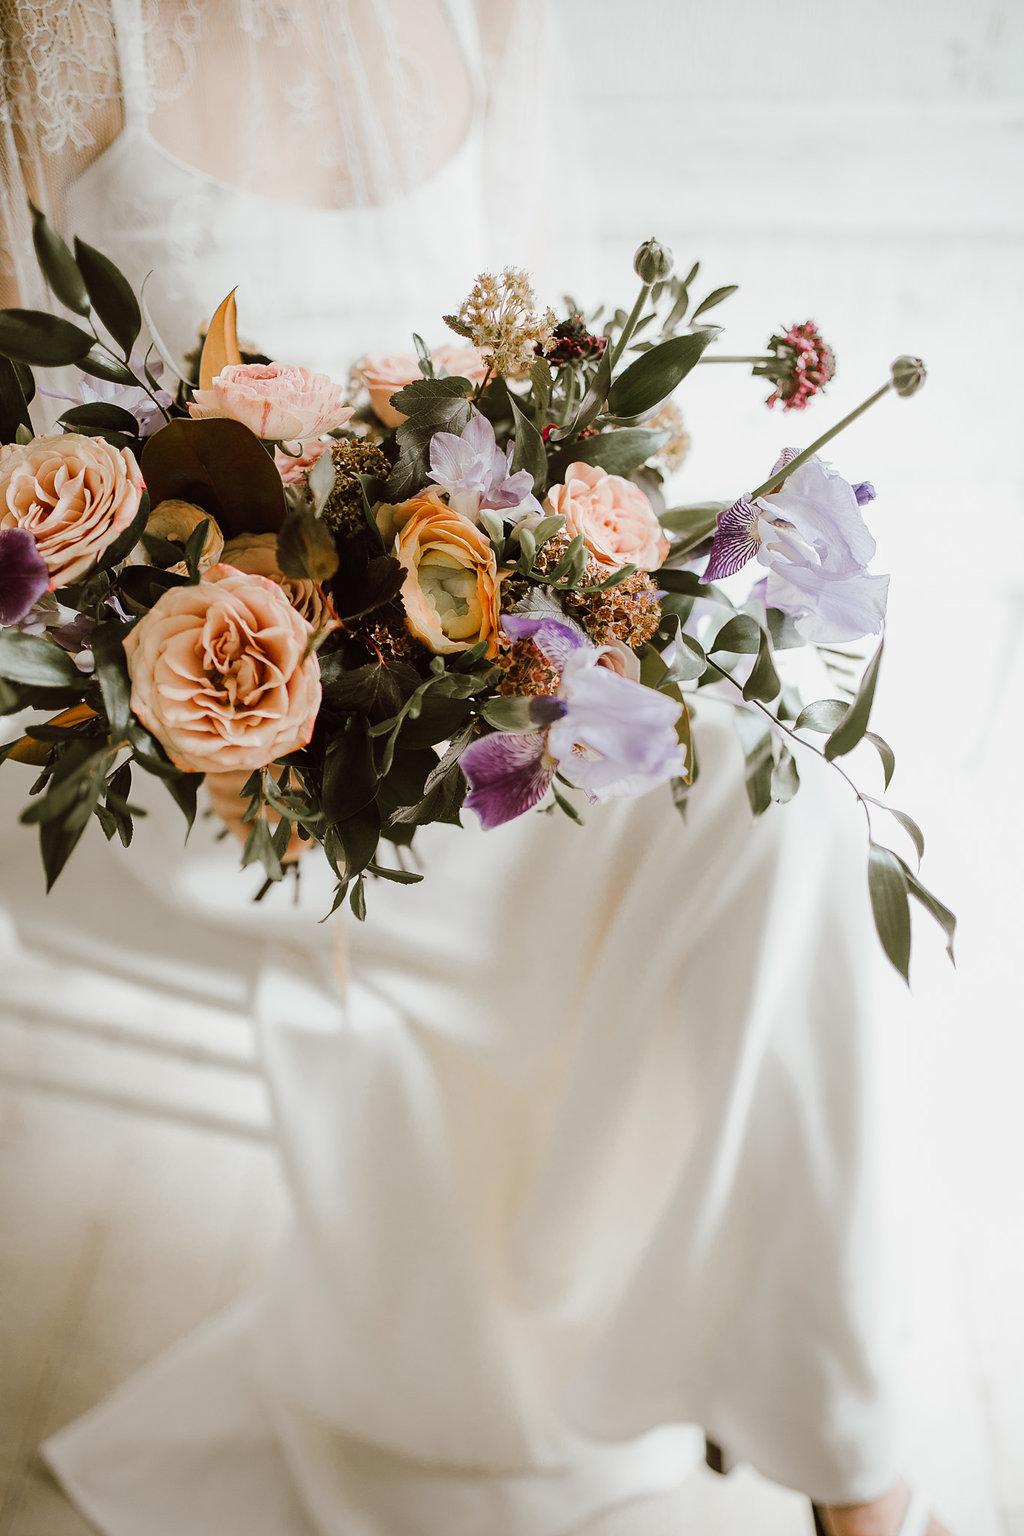 Cappucino Rose wedding bouquet - Wedding Flowers winnipeg